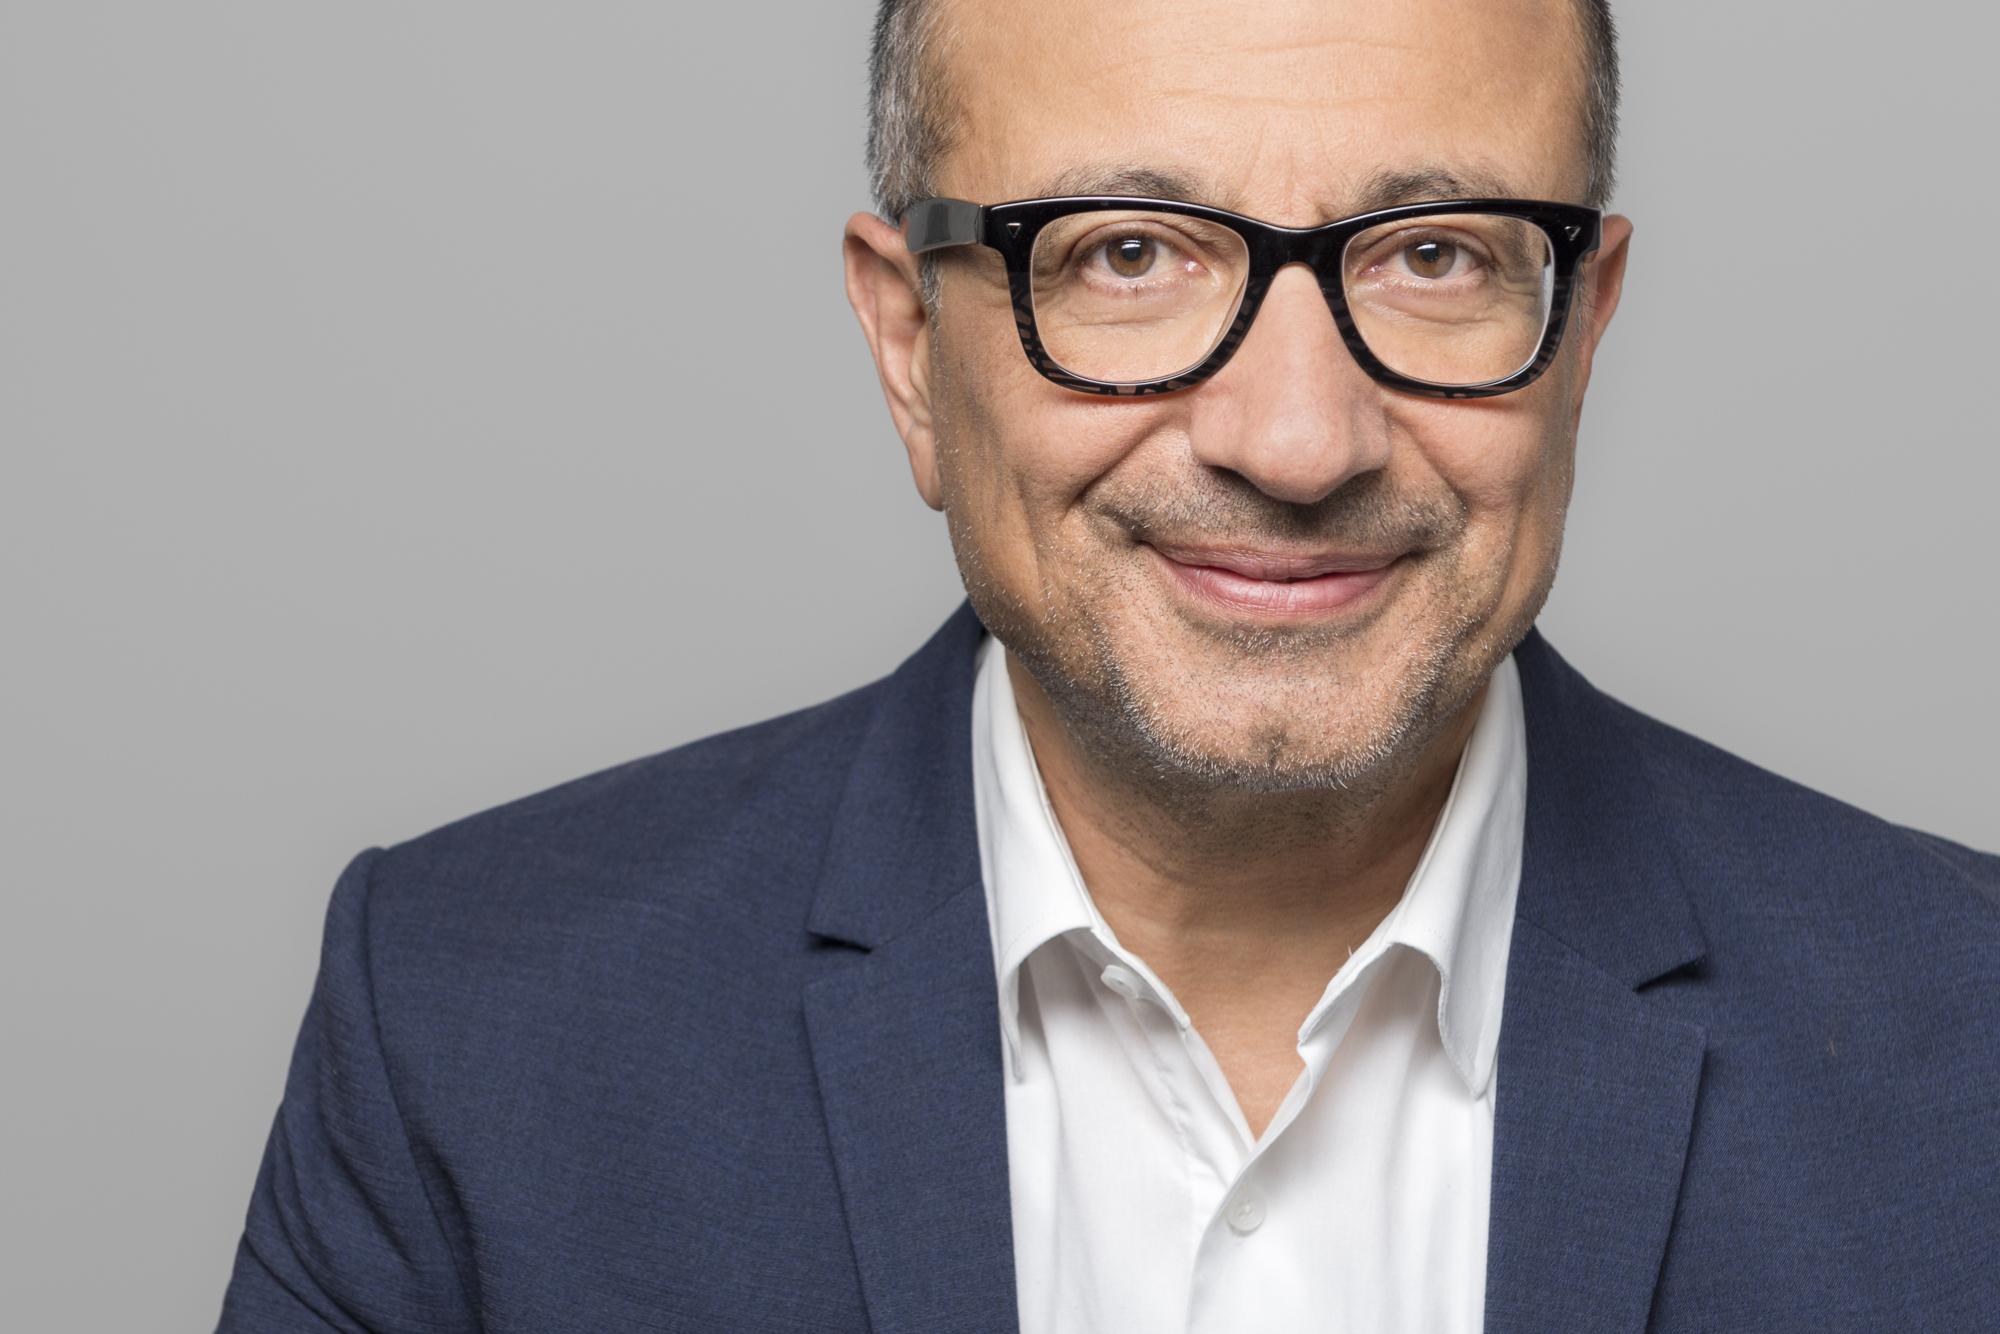 Dr. Hamid Saberi